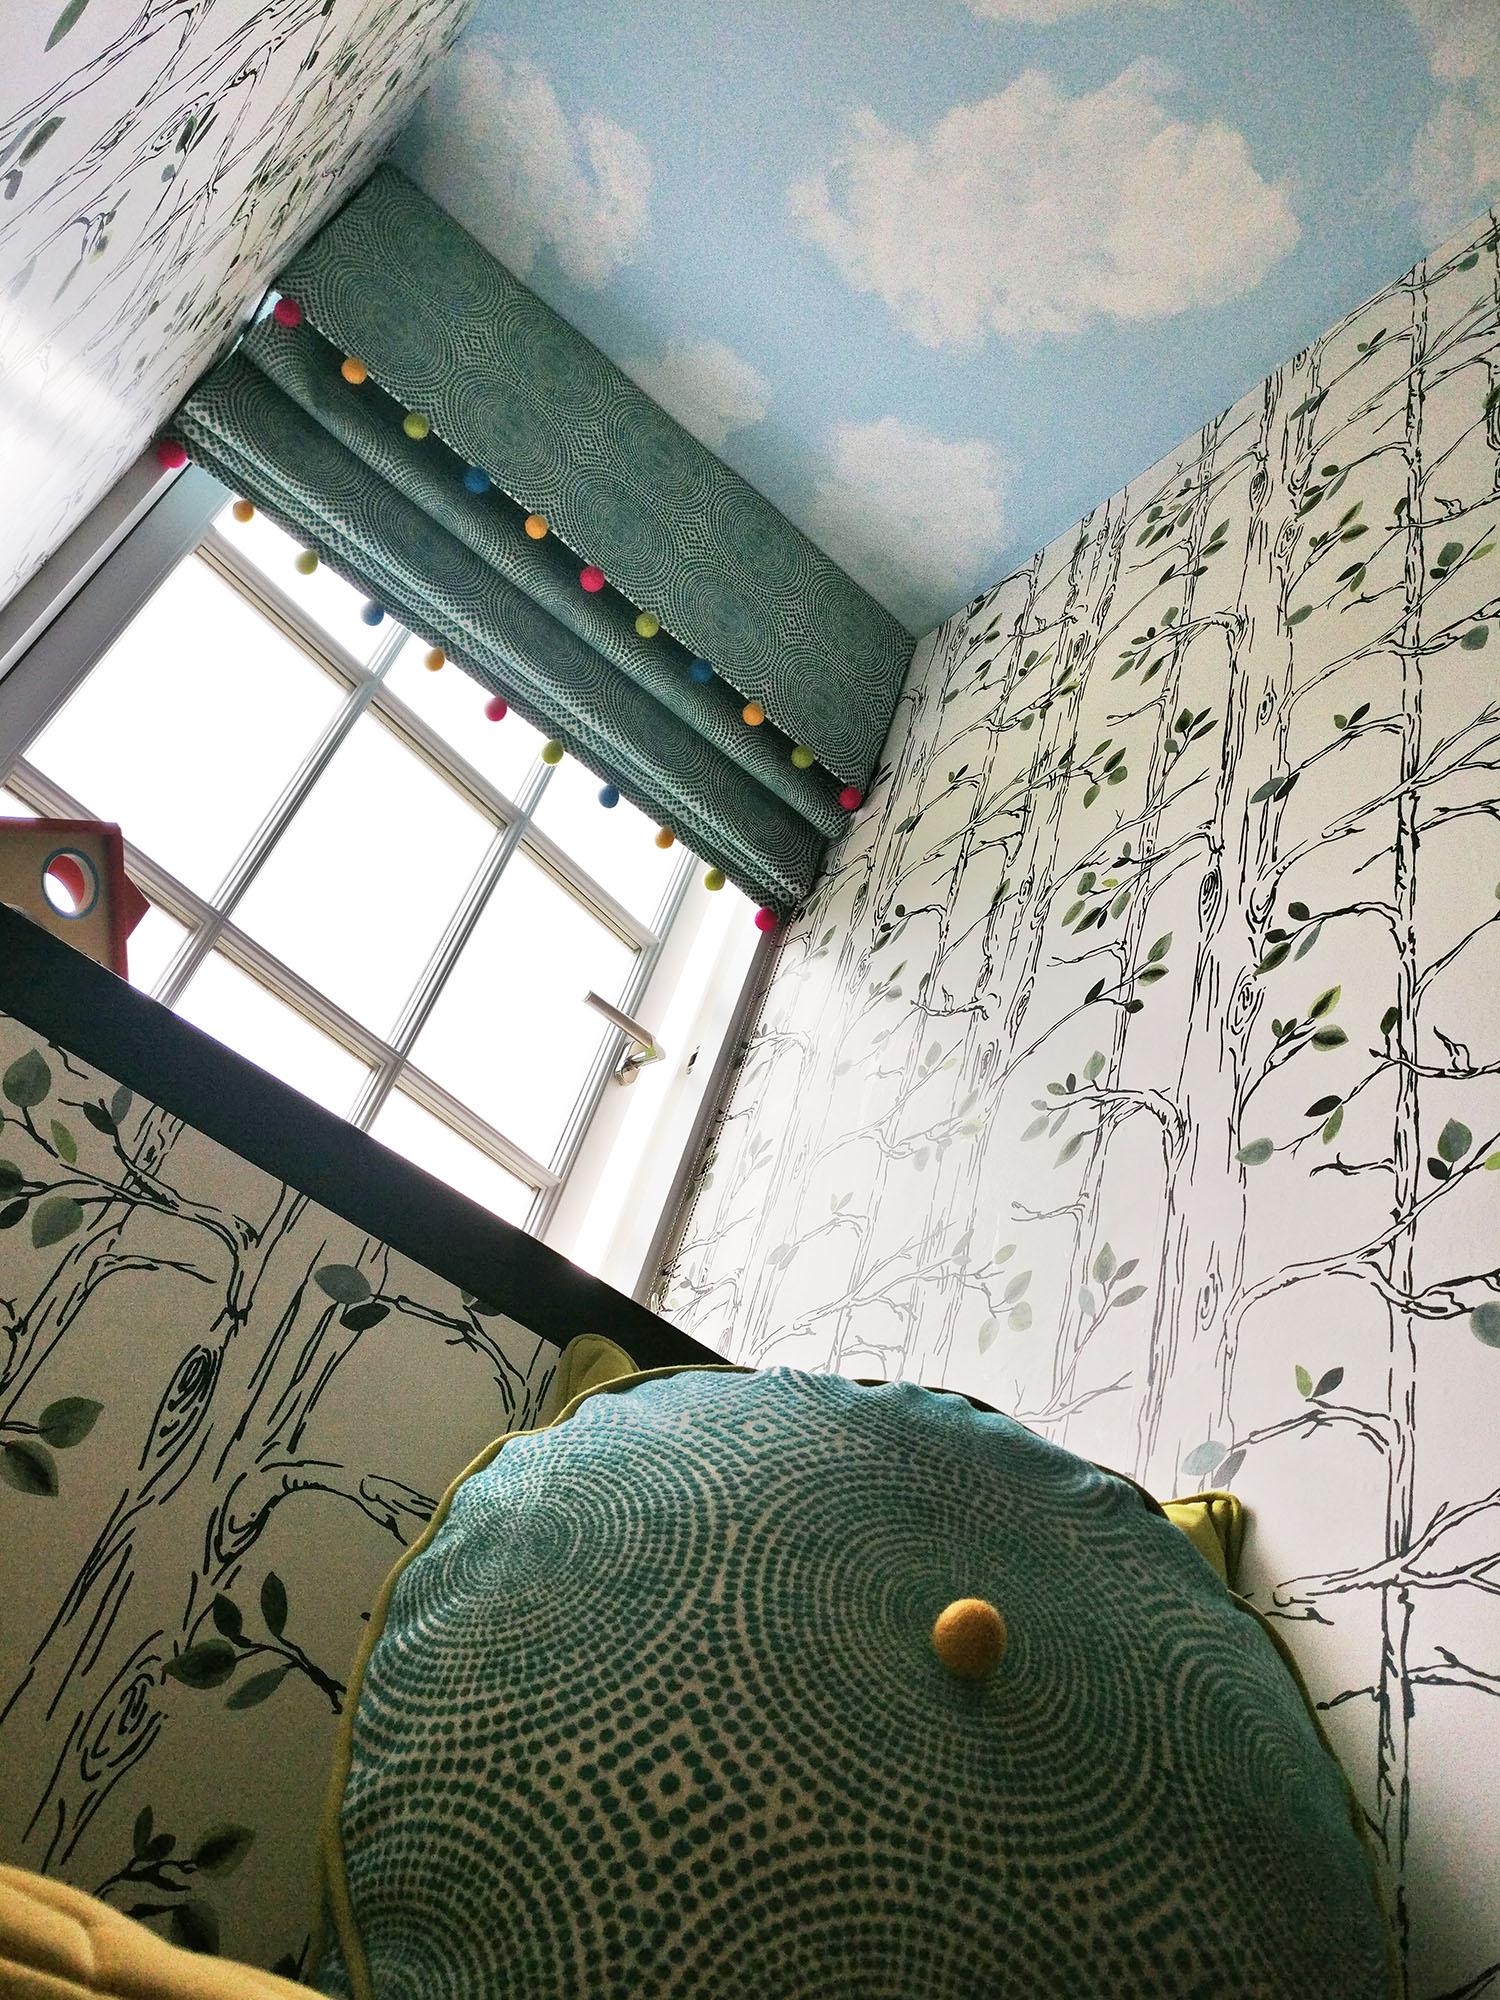 Sky Mural and Pompom blinds